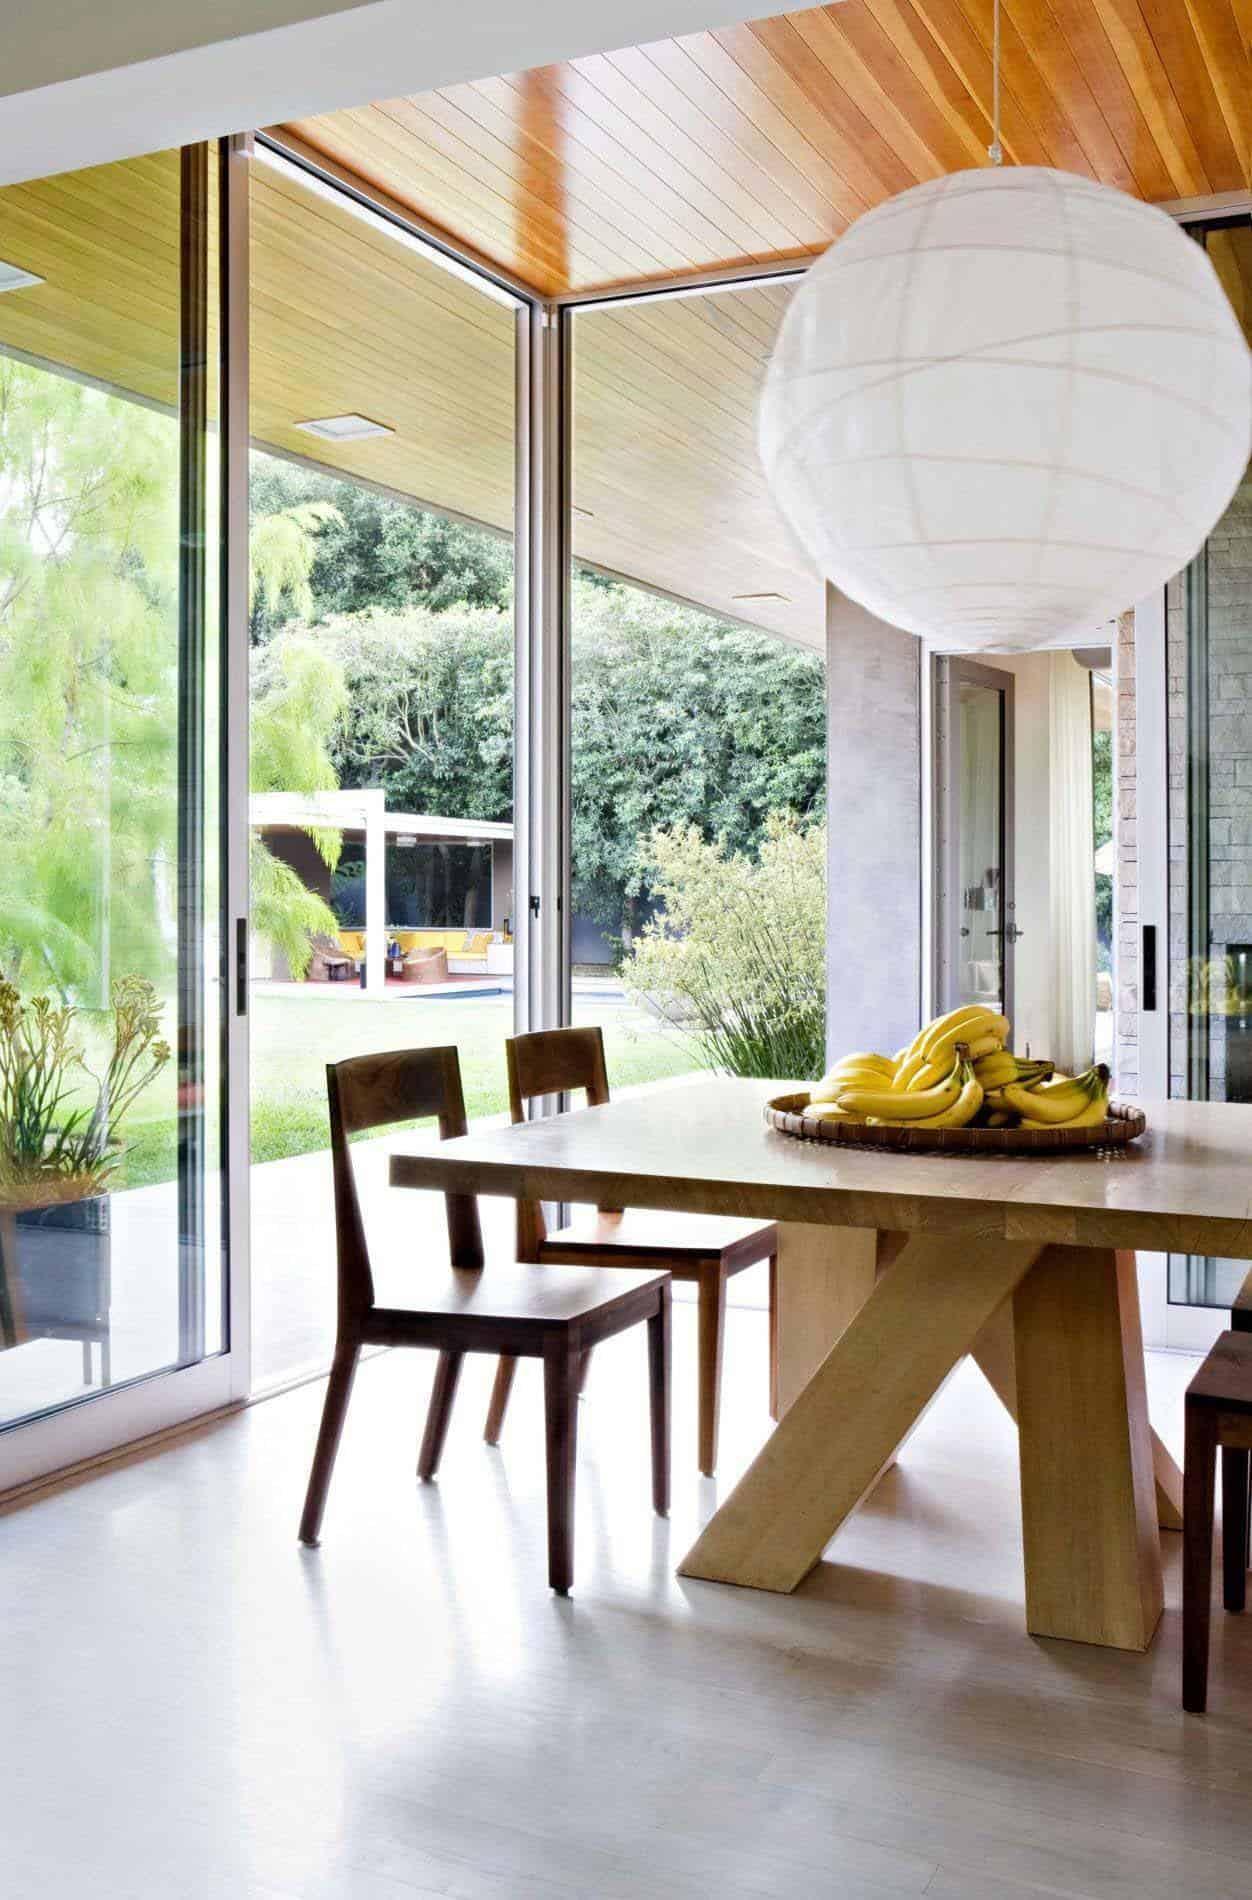 Maison Moderne Mid-Century-Jamie Bush-07-1 Kindesign